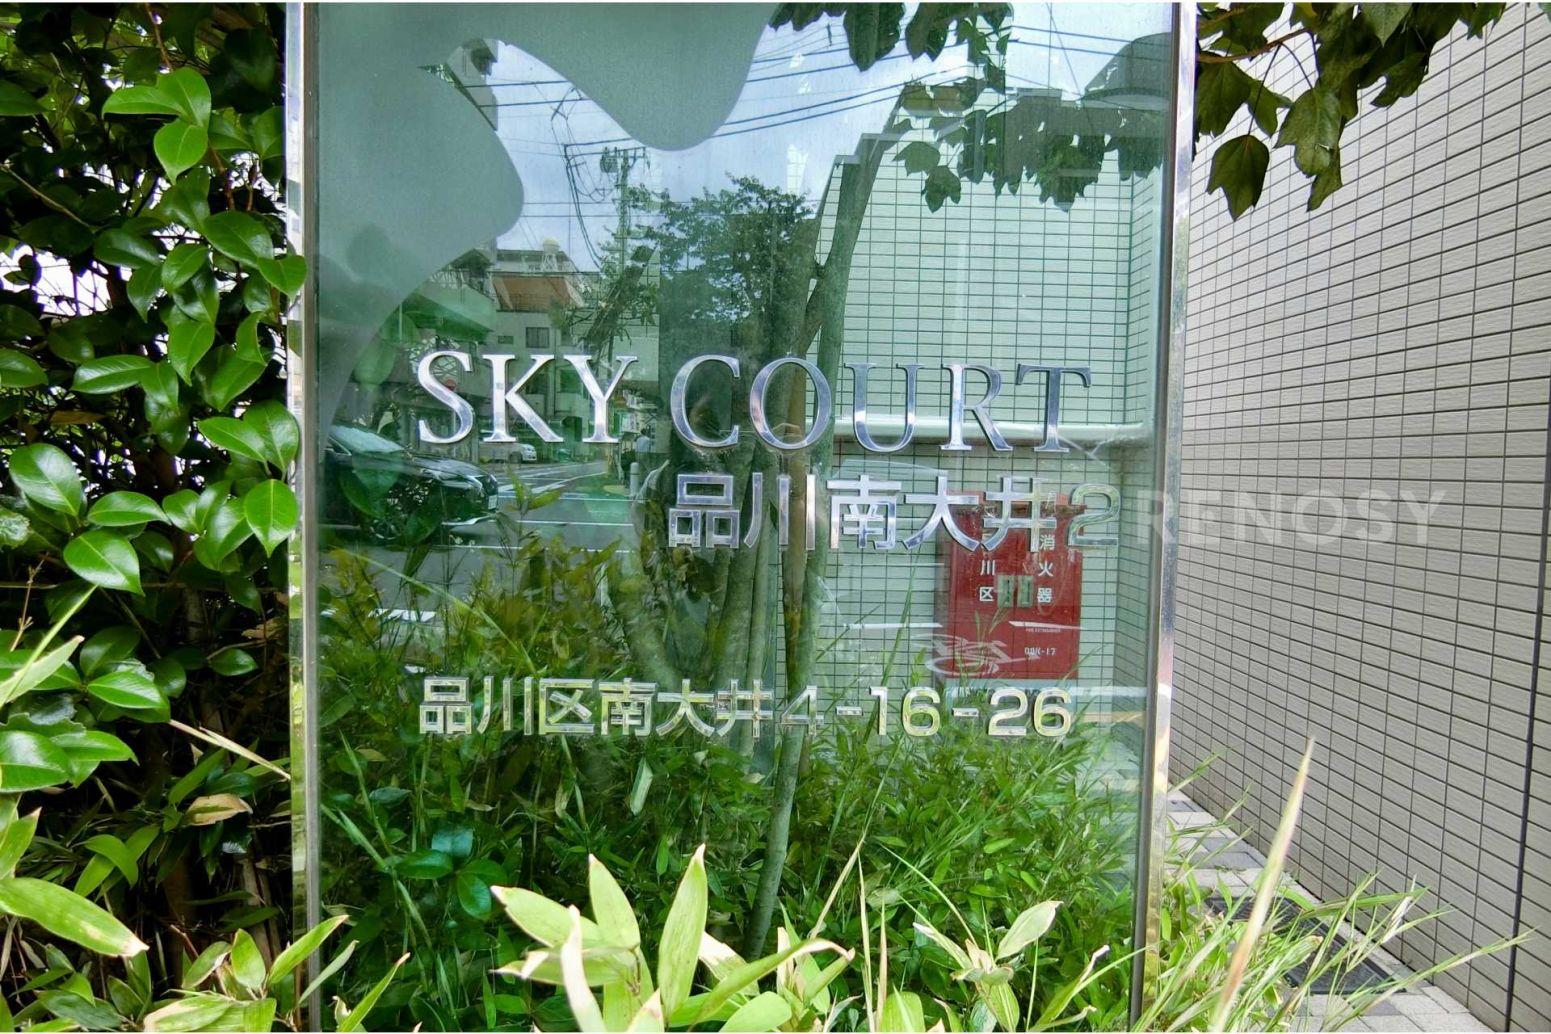 SKYCOURT品川南大井2